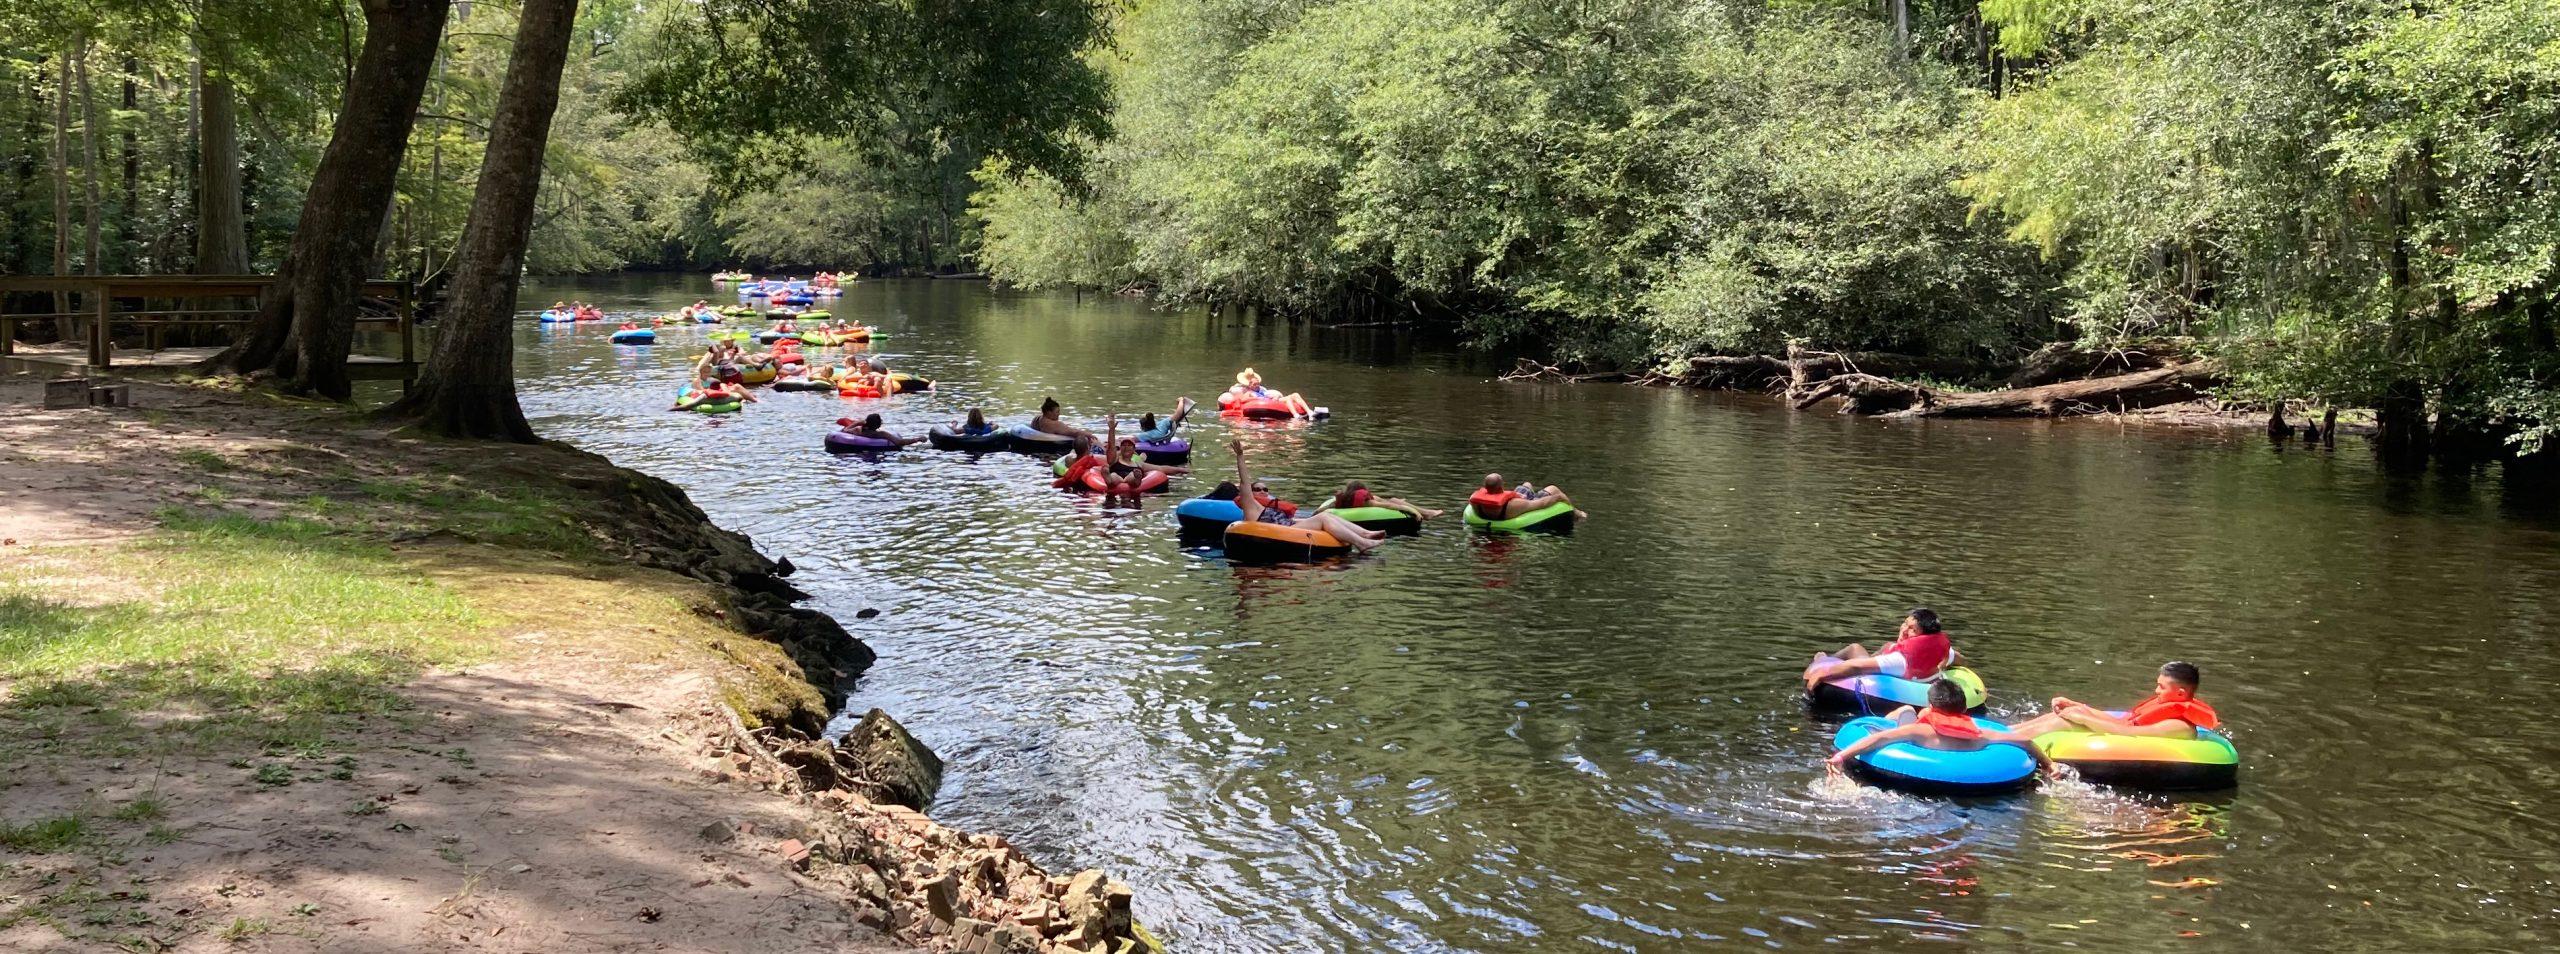 Fellowship at the River